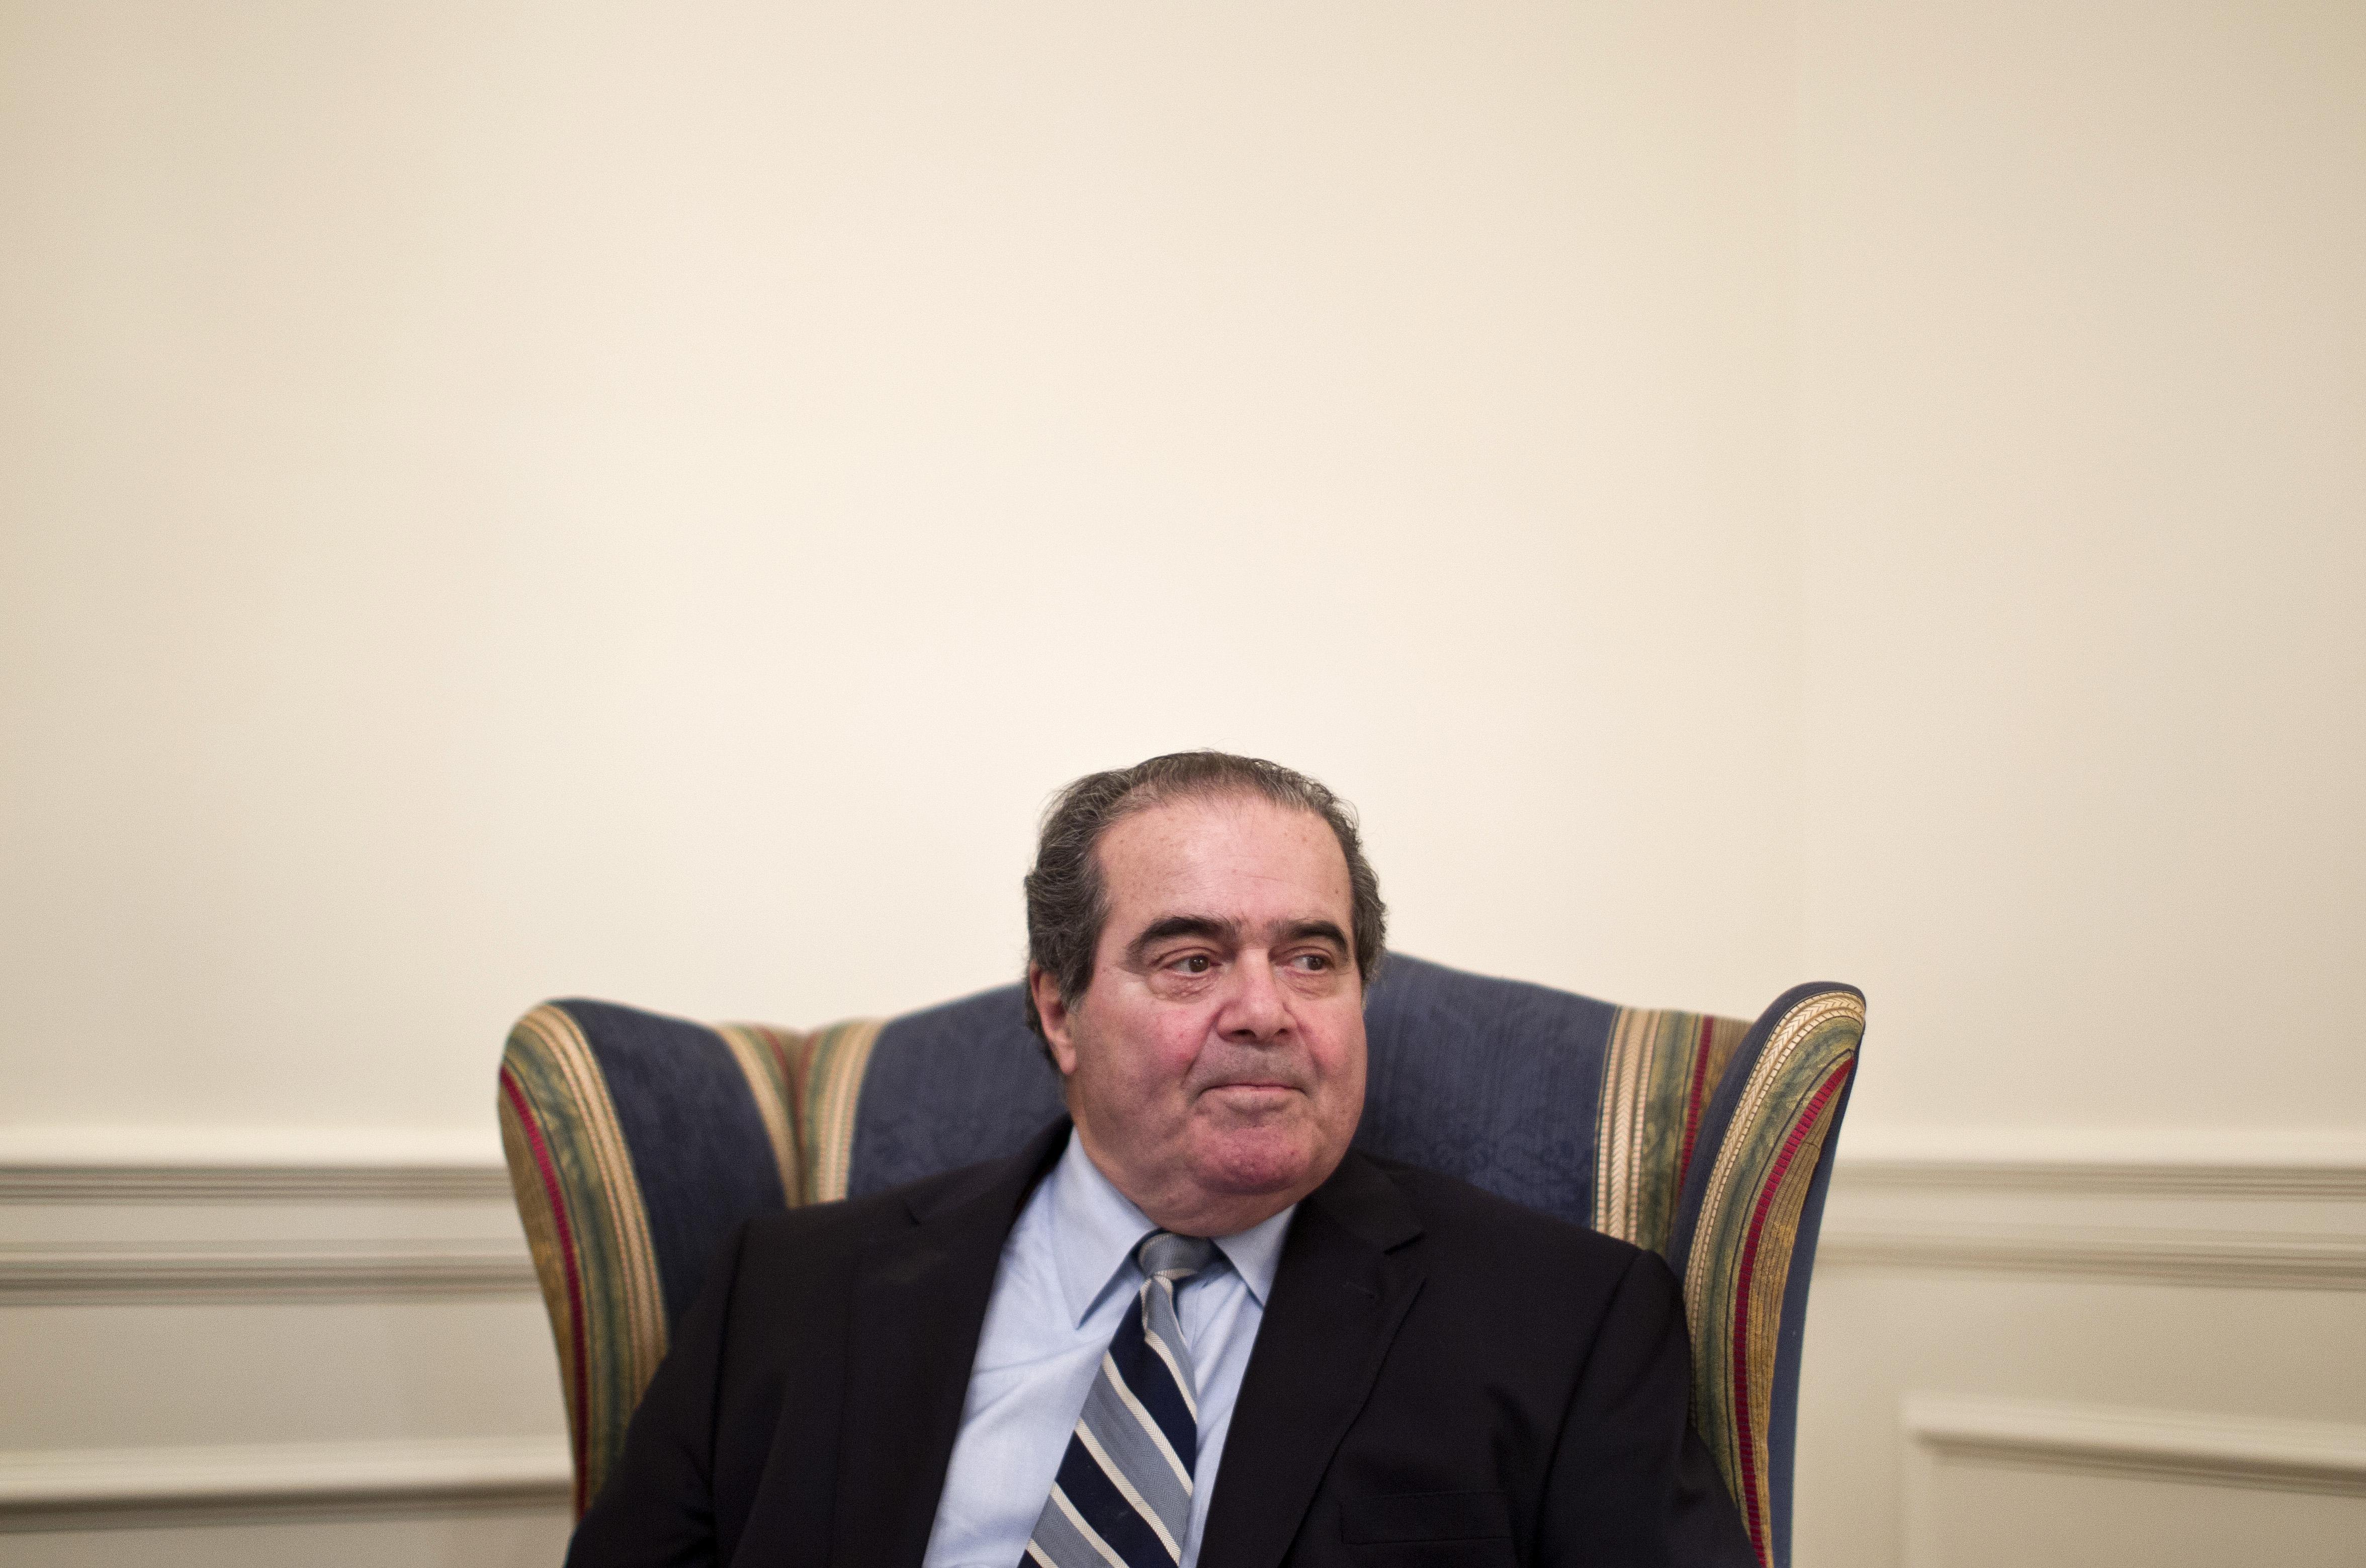 Obama to Nominate Scalia Successor 'in Due Time'